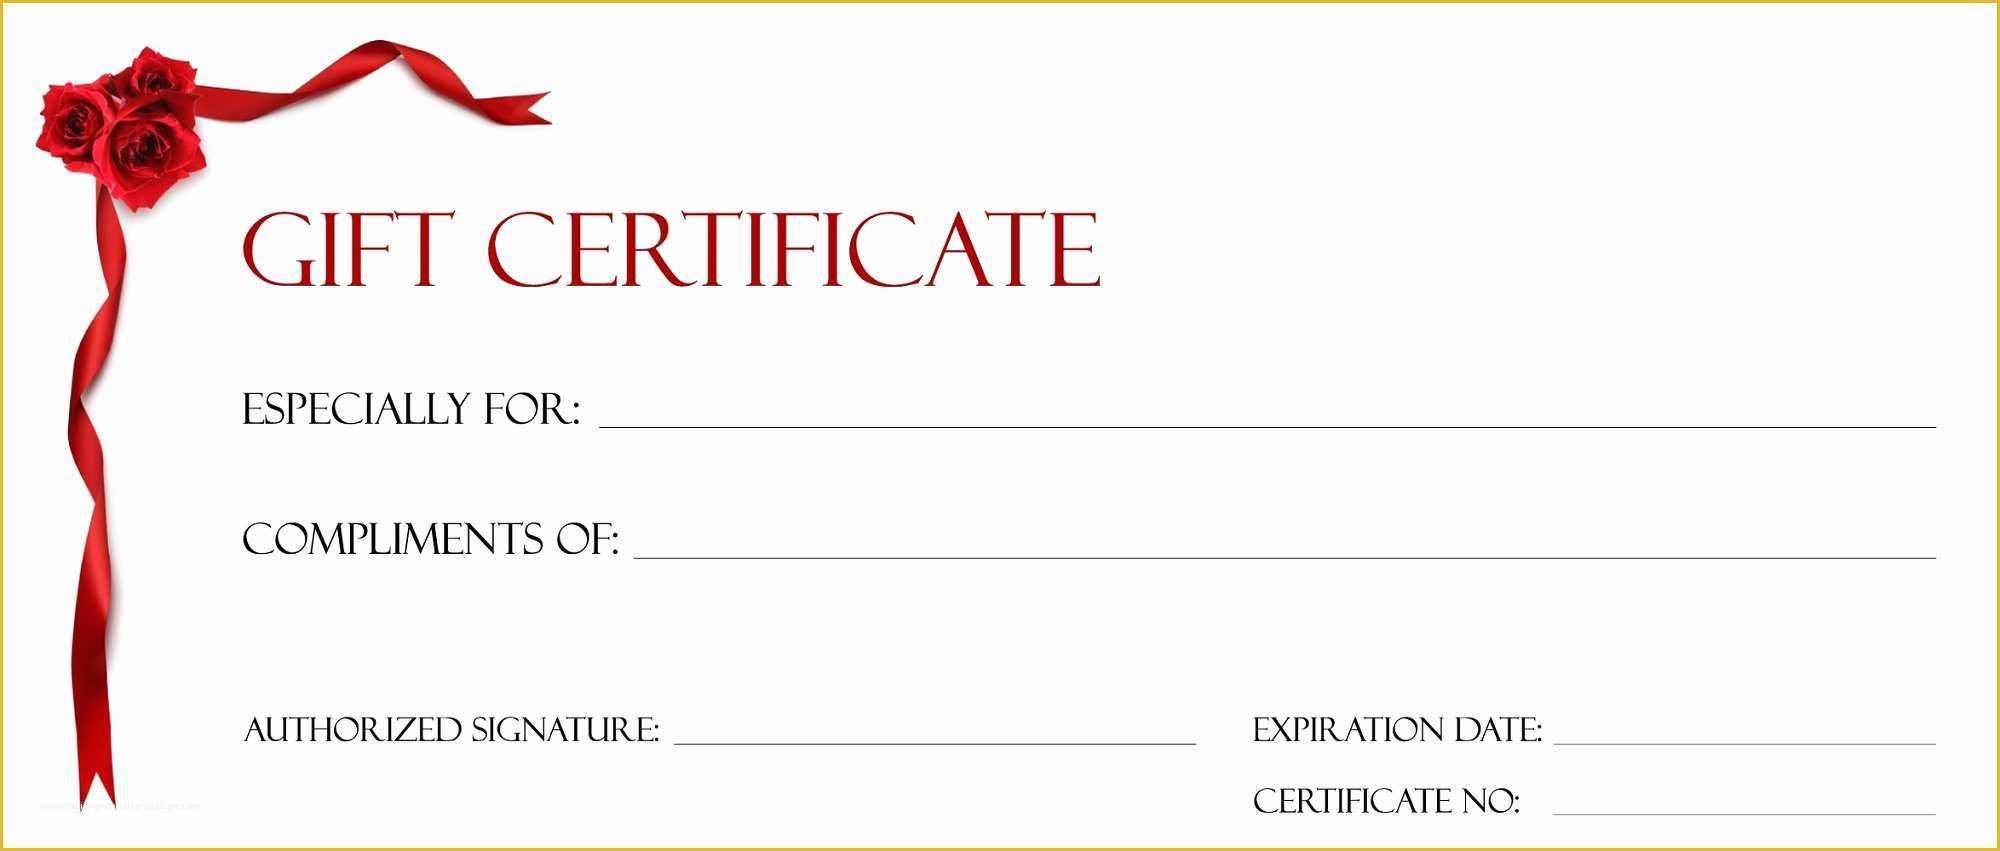 Printable Christmas Gift Certificate Template Regarding Free Christmas Gift Certificate Templates